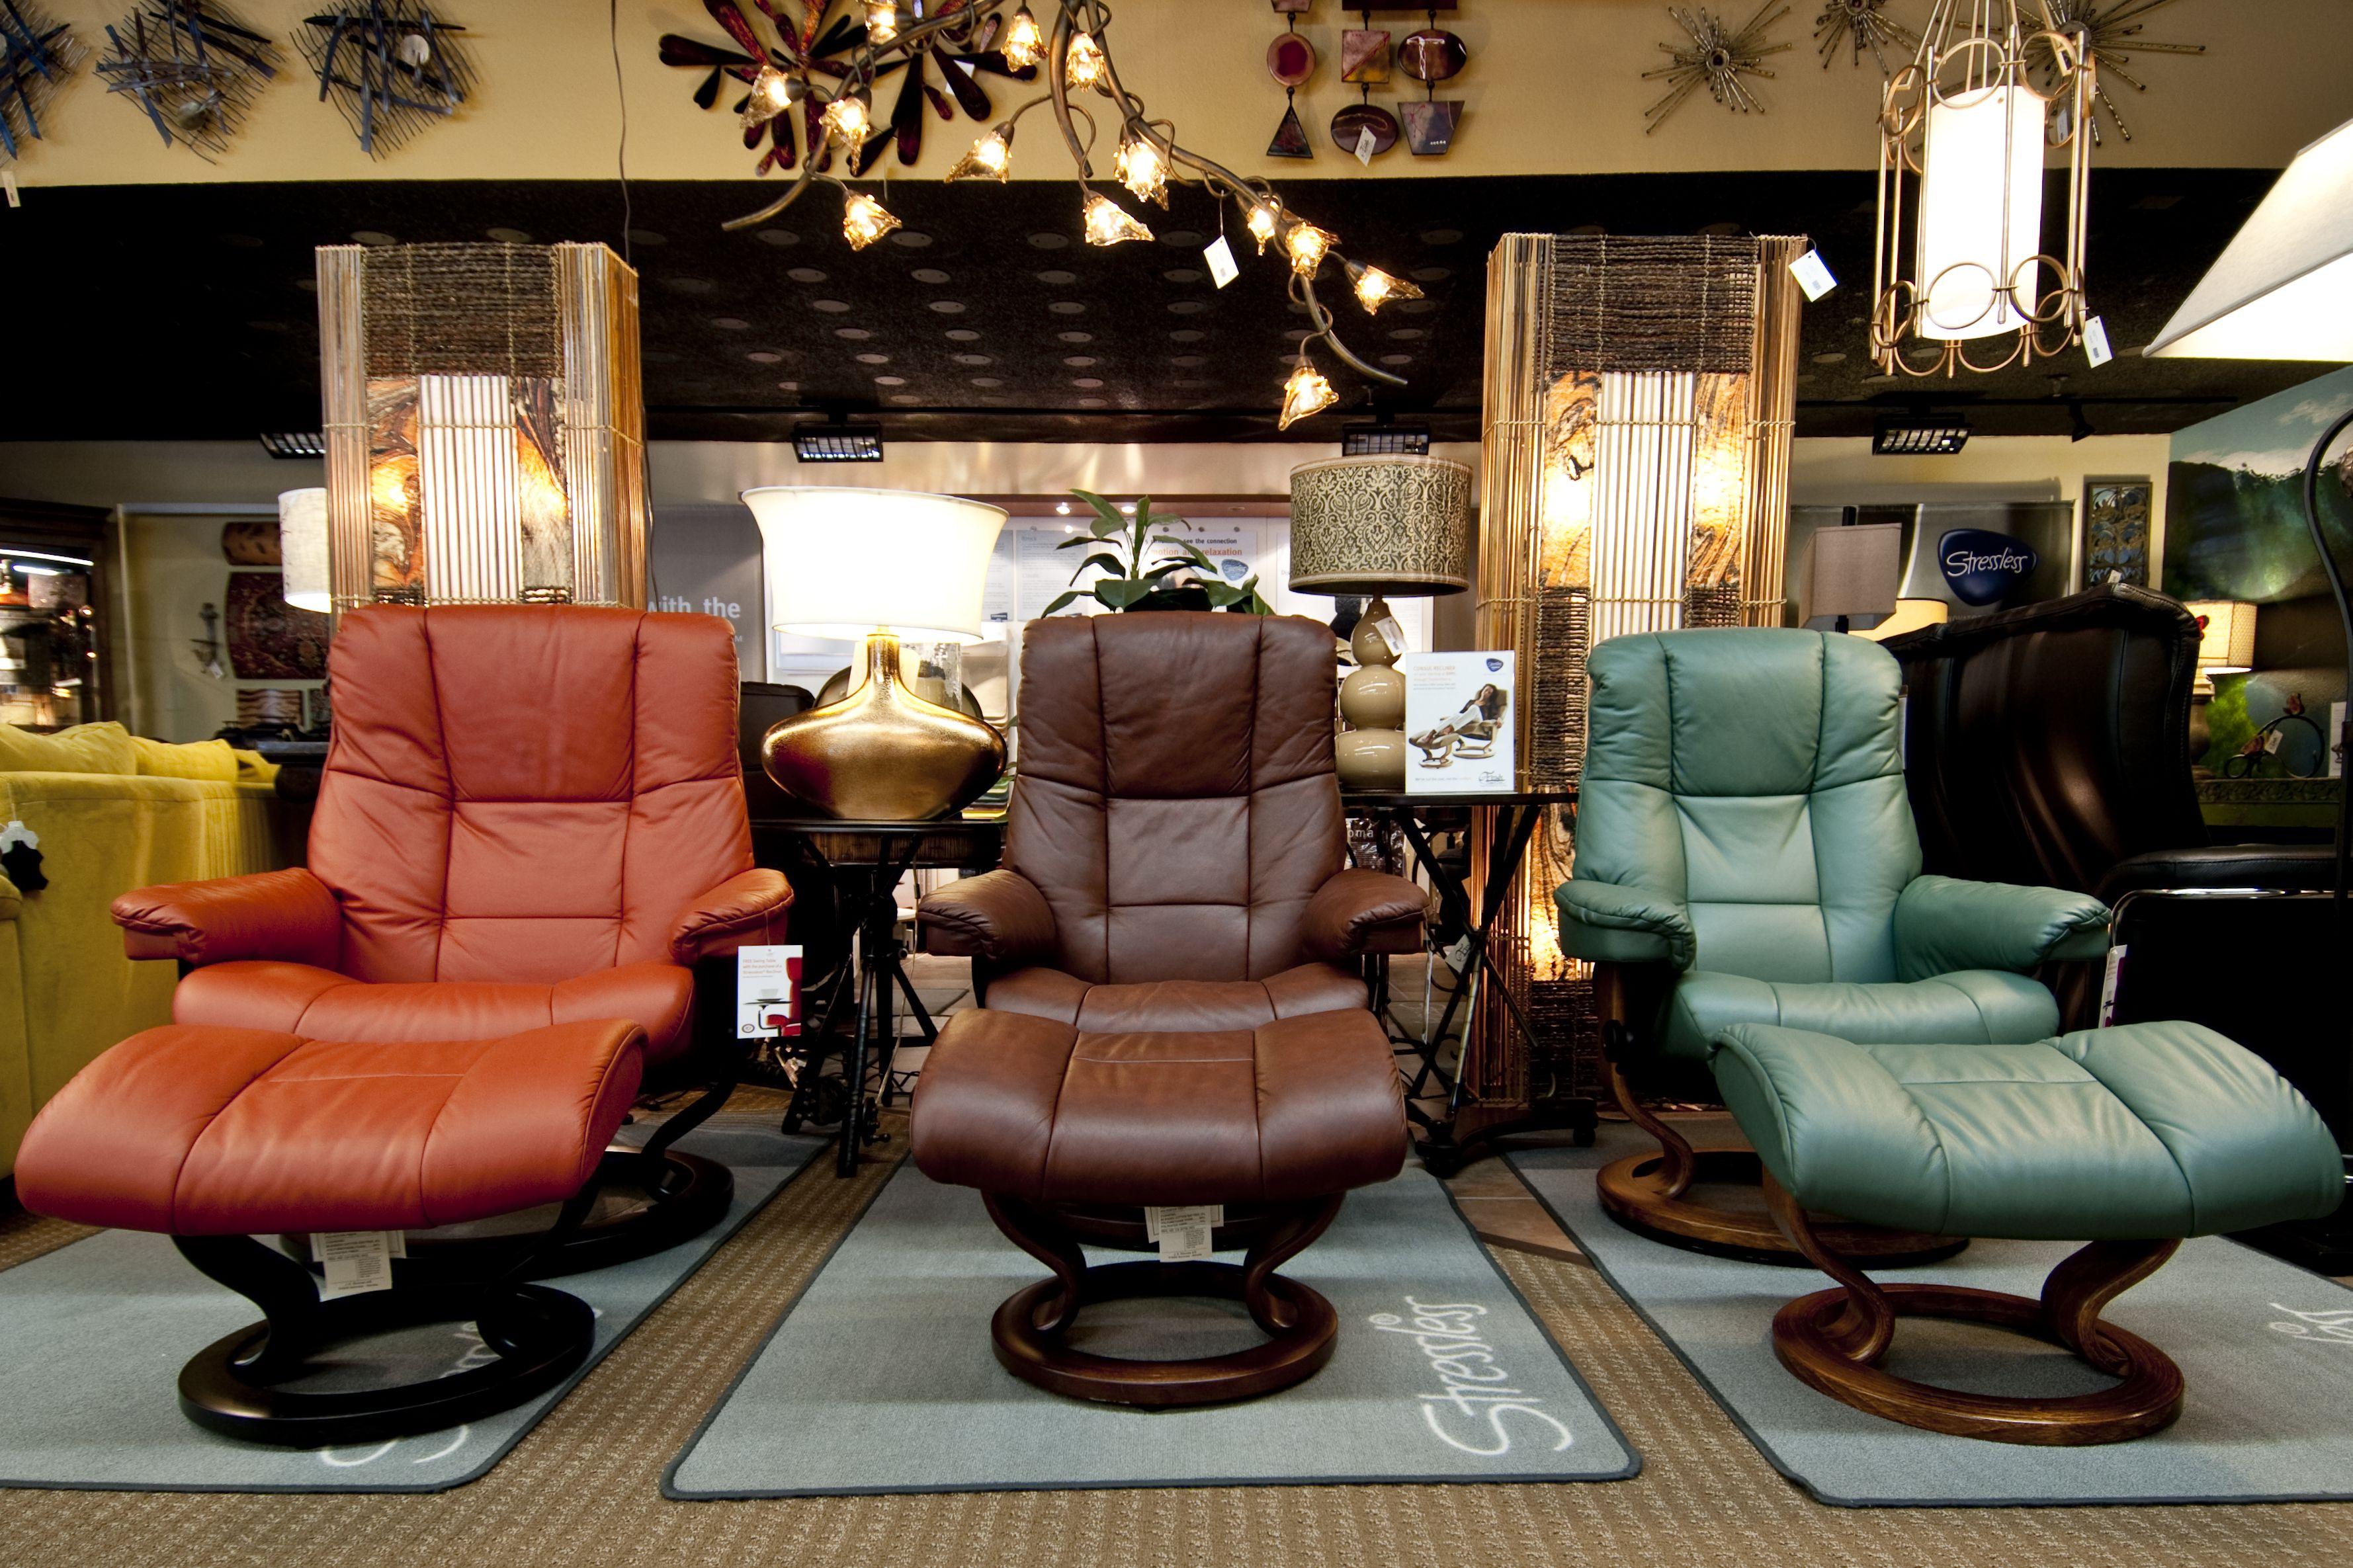 Stressless recliners  Finds Design & Decor, Chico CA  furniturechico.com